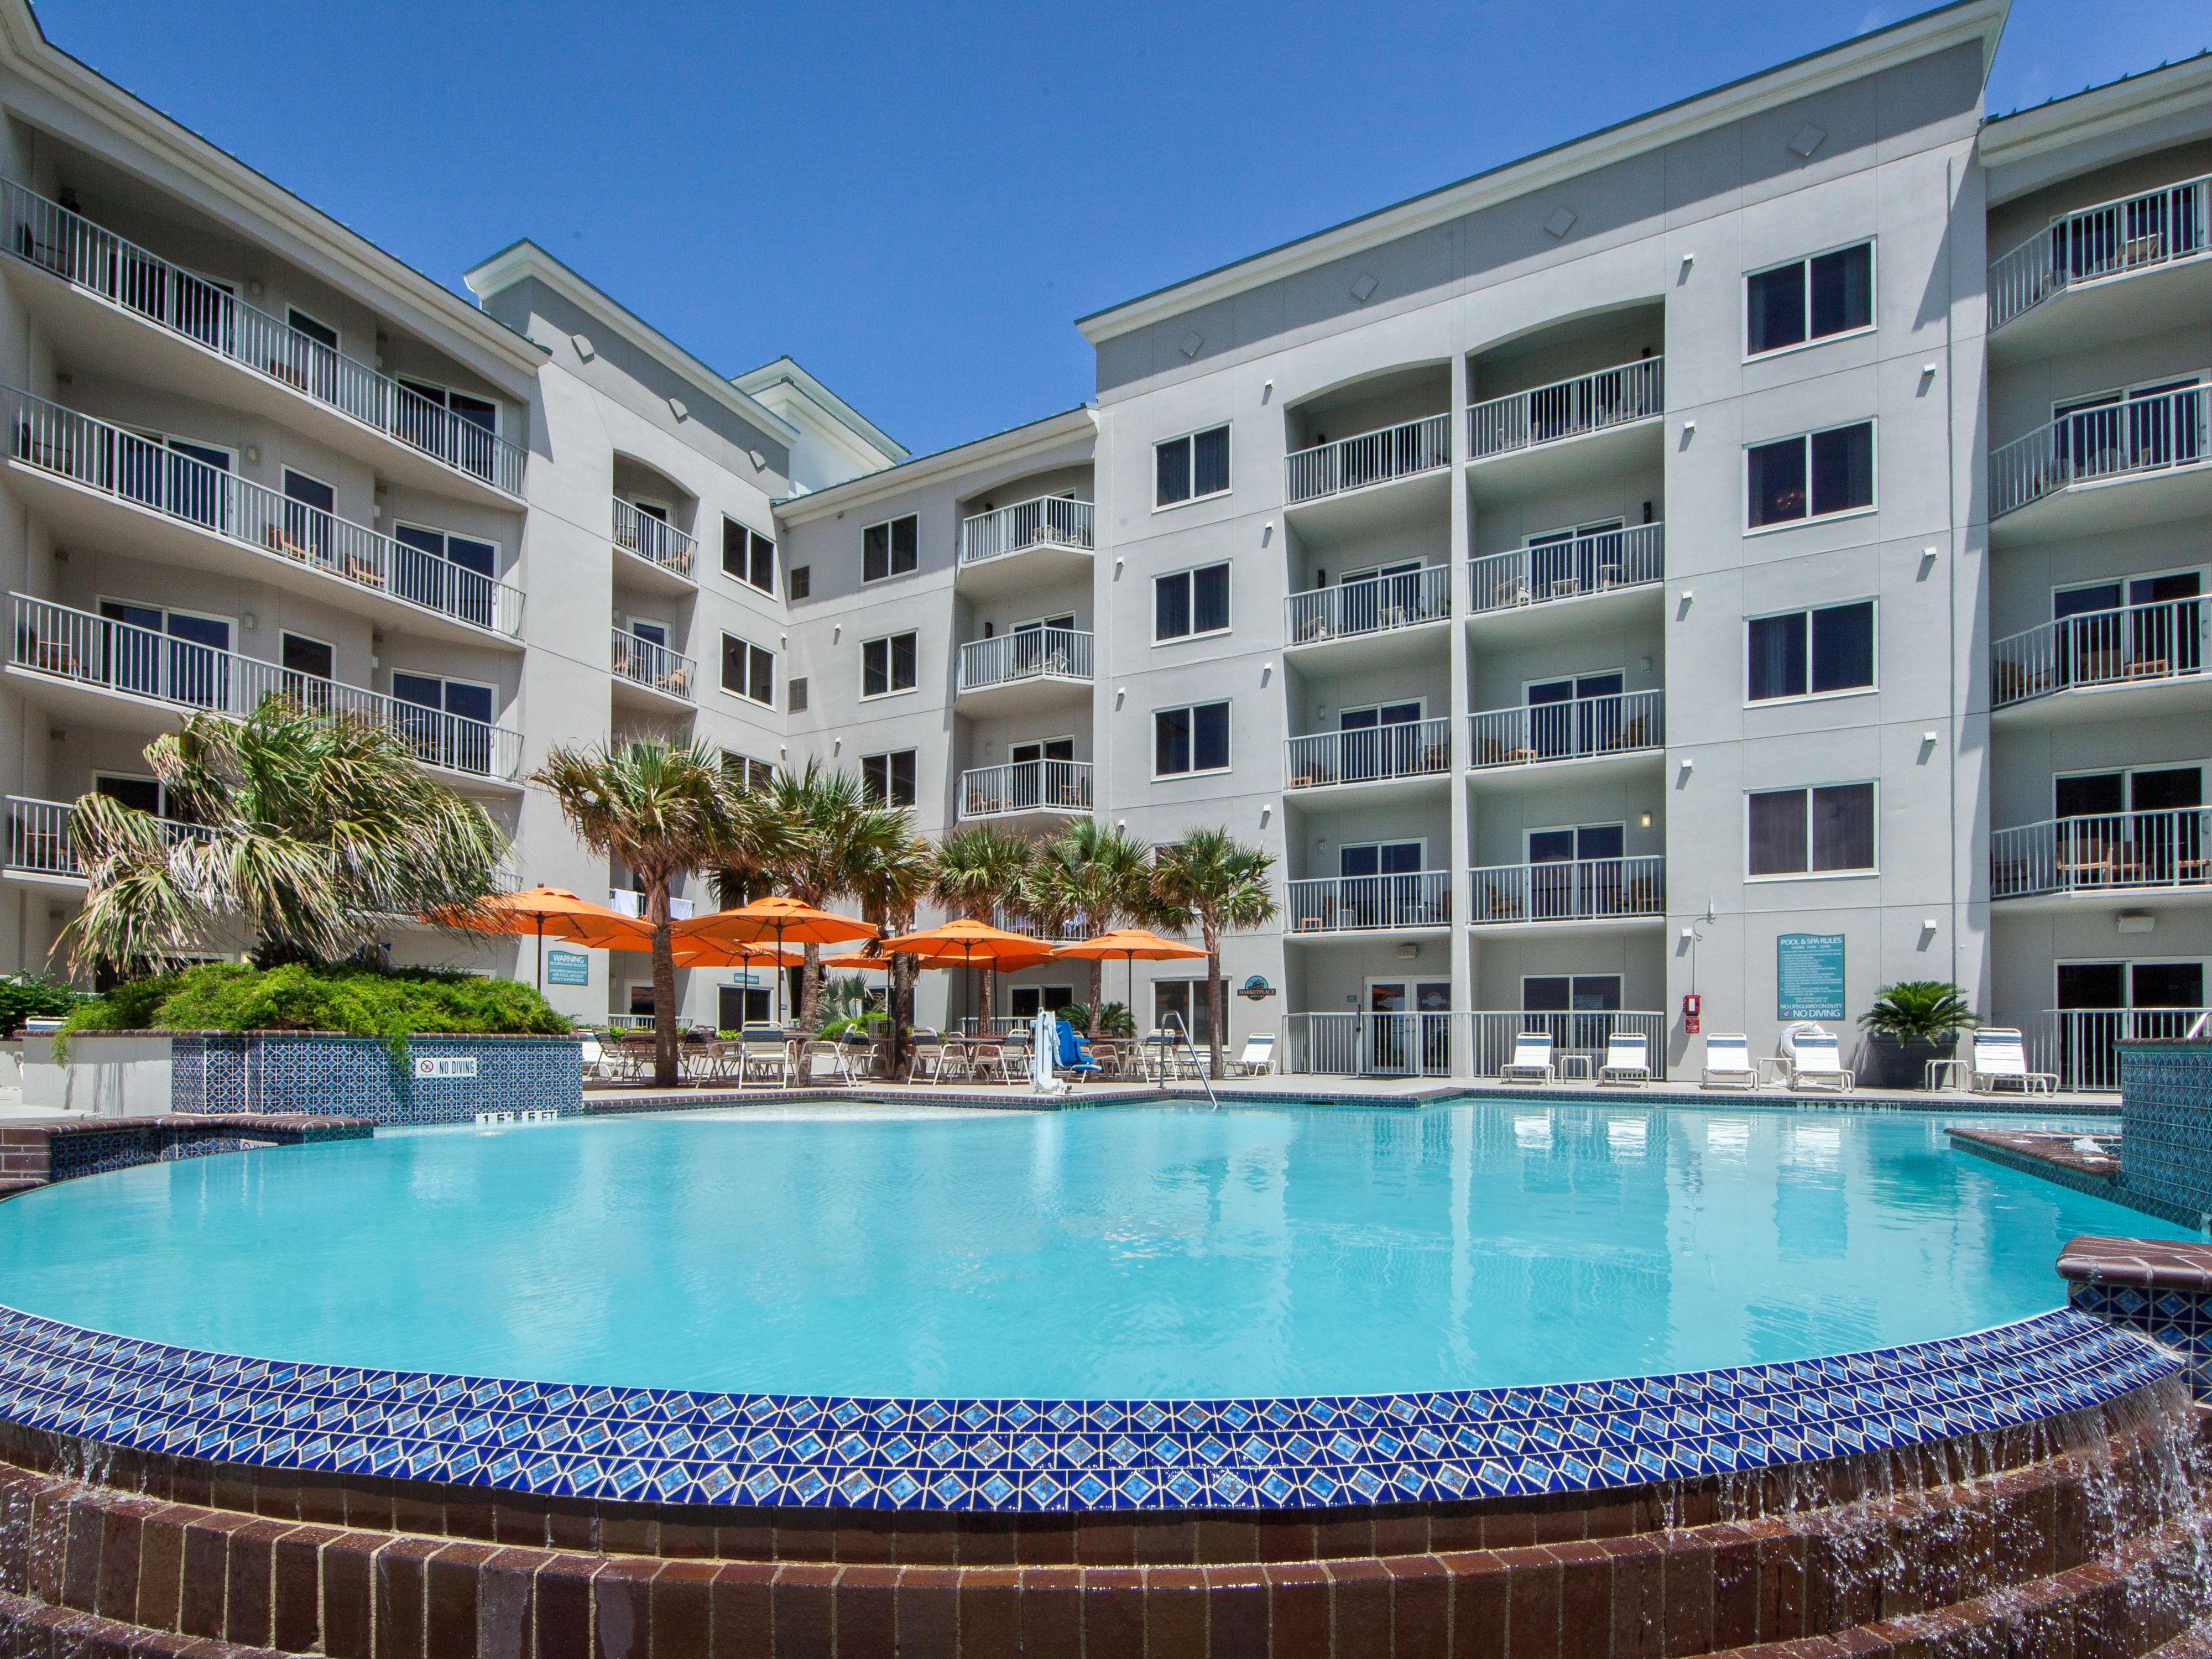 Holiday Inn Club Vacations Galveston Beach Resort In Galveston, Texas Pictures Gallery